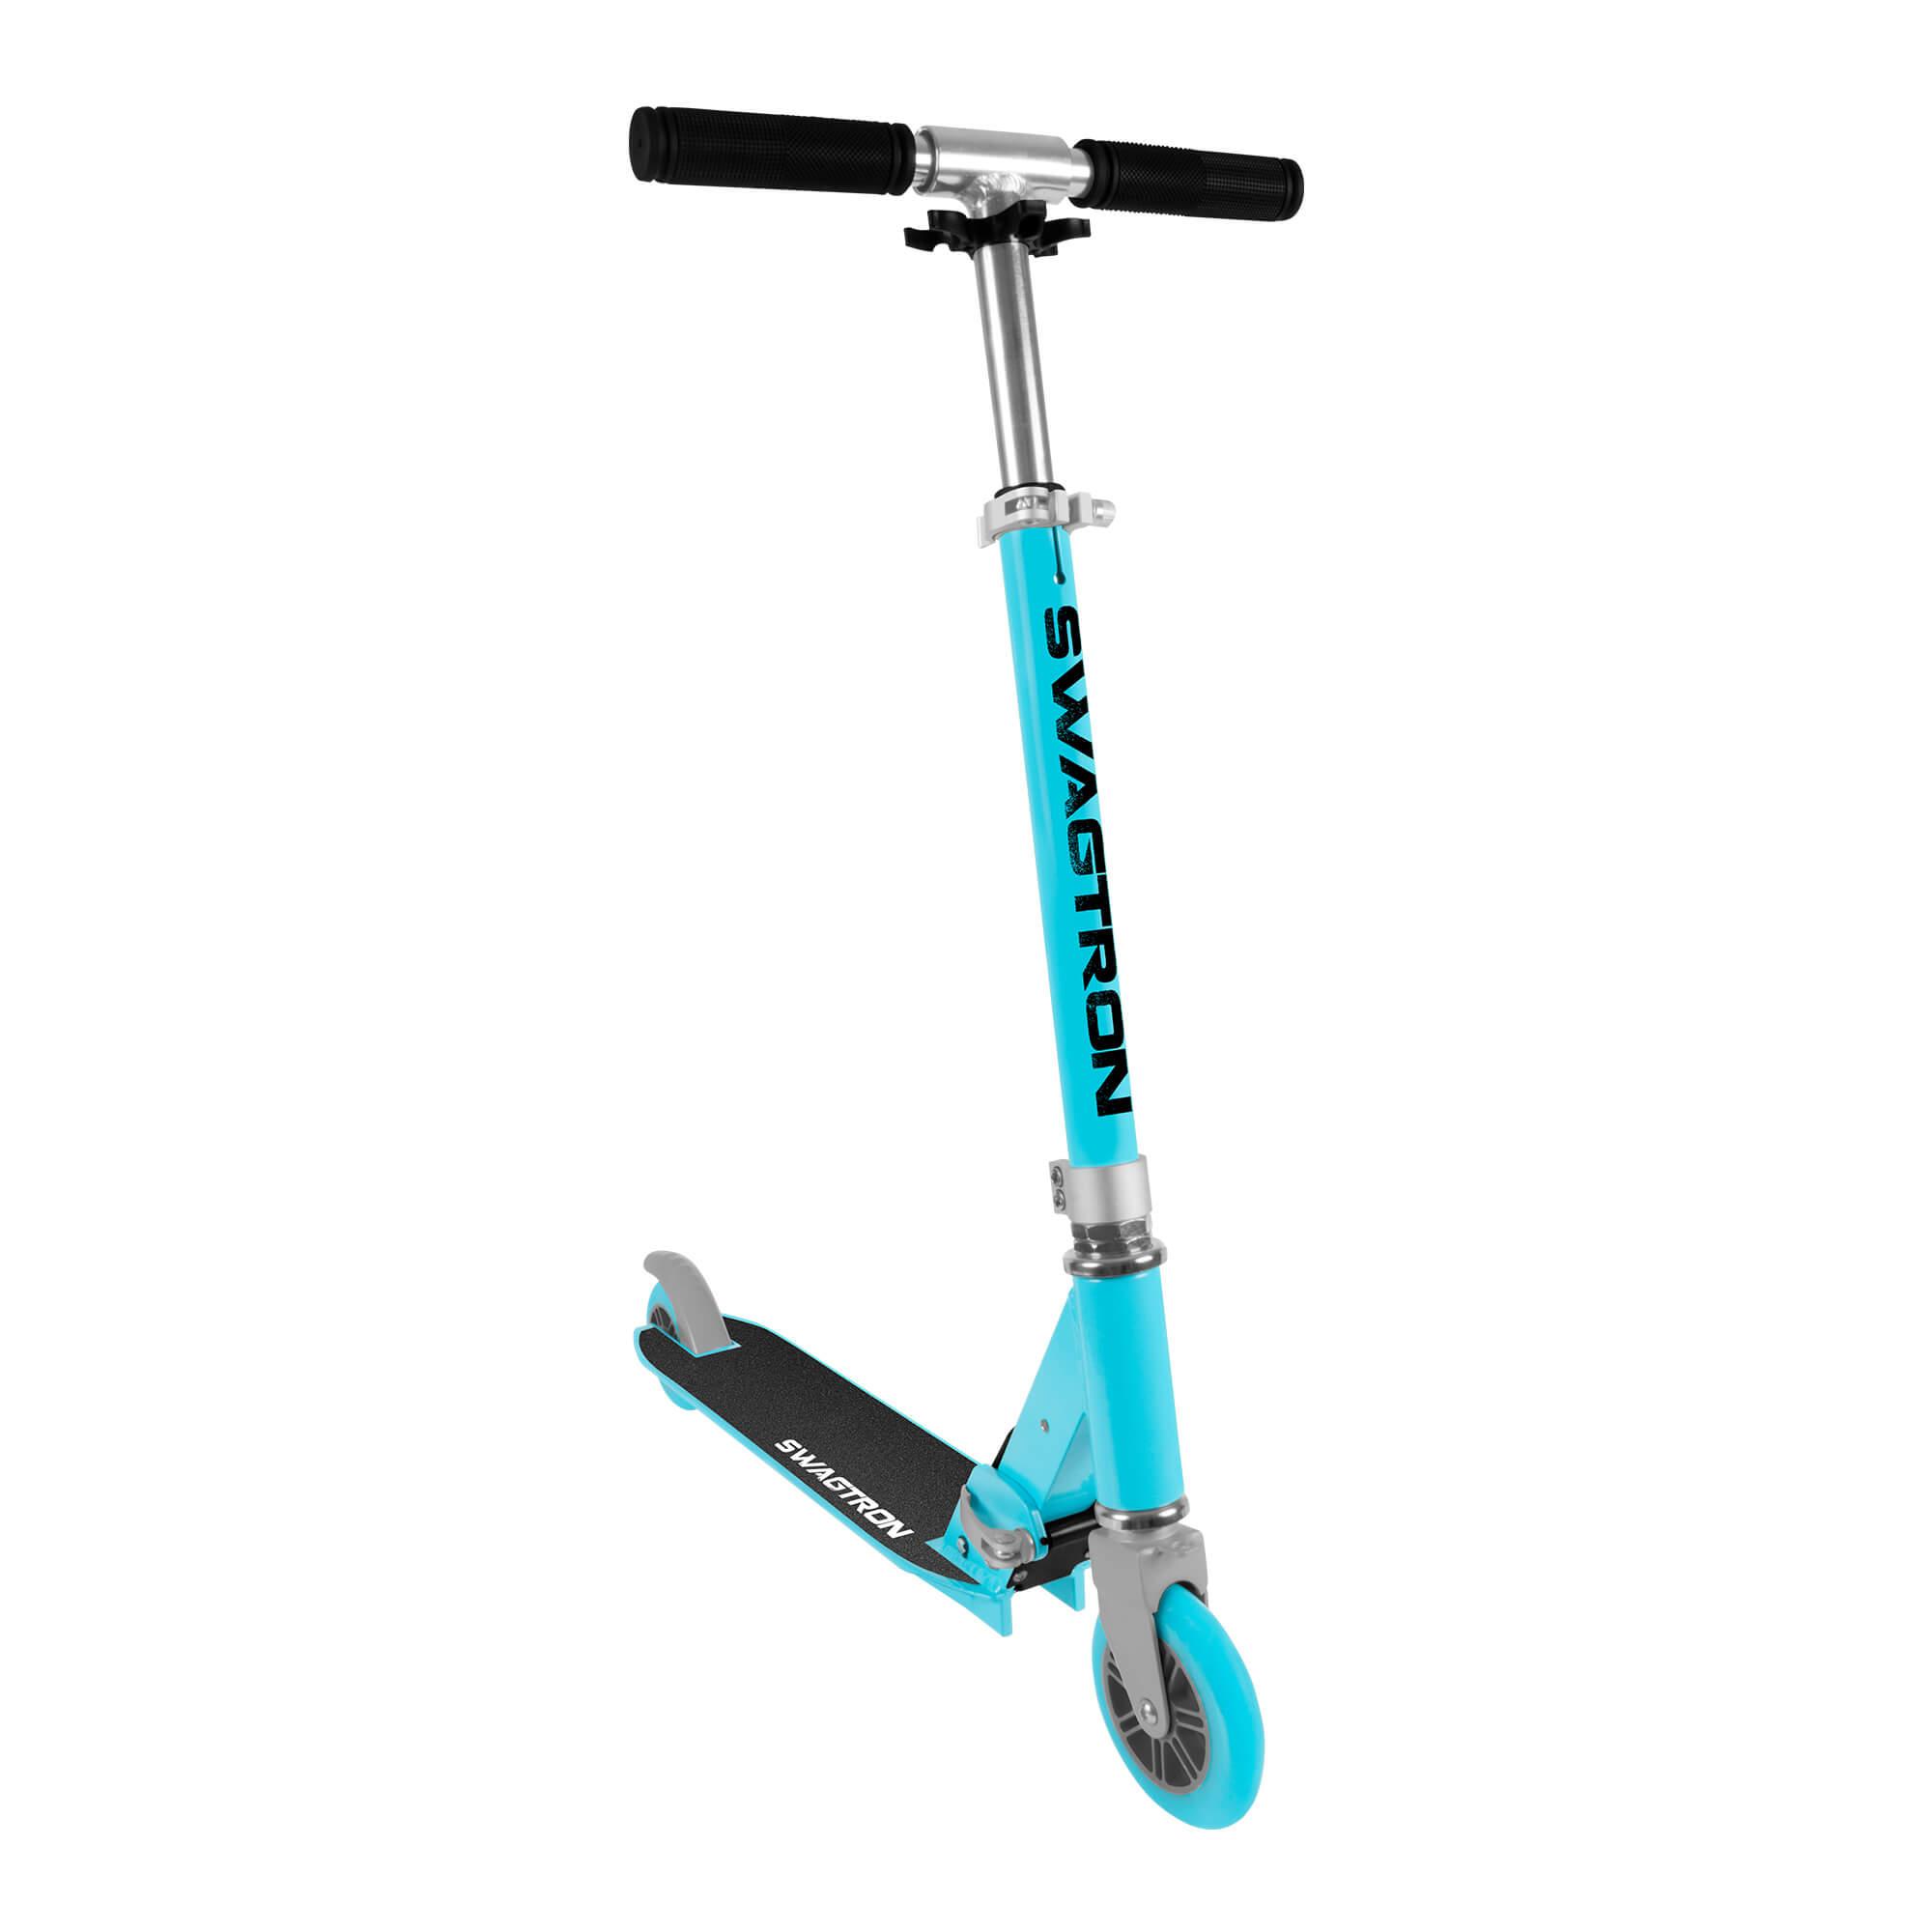 K1 Kids Kick Scooter Light Blue color